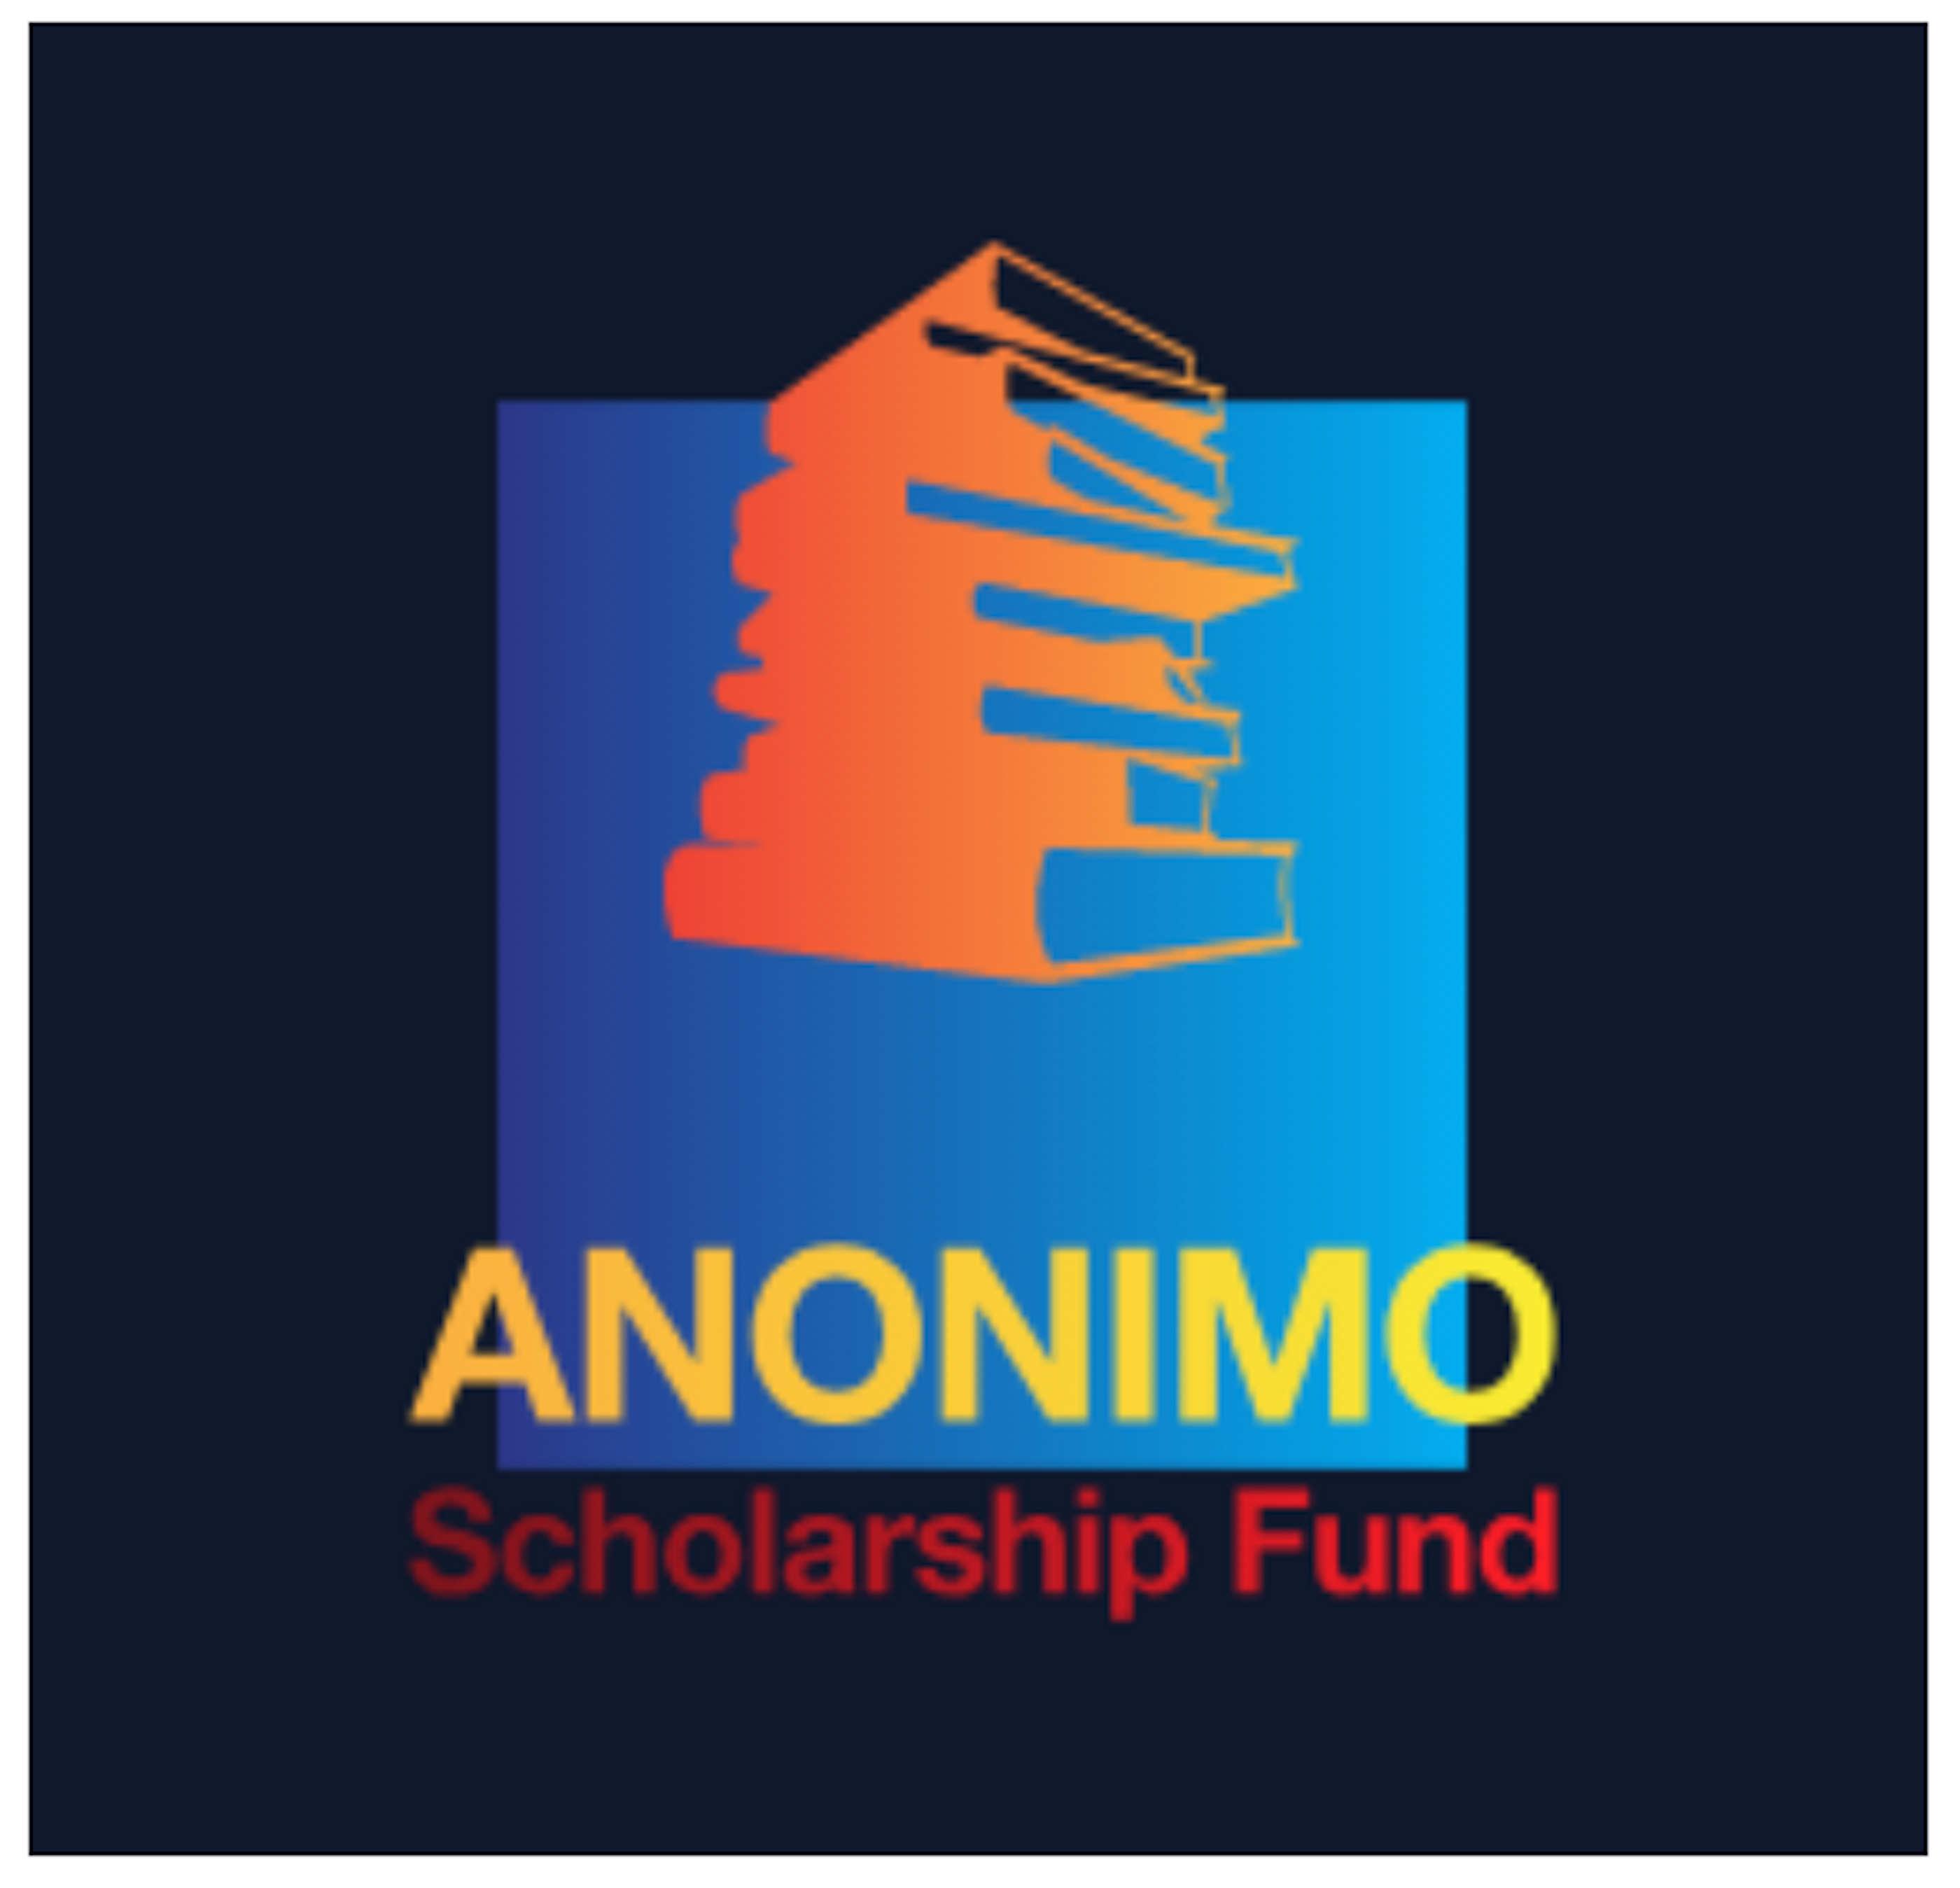 scholarship fund